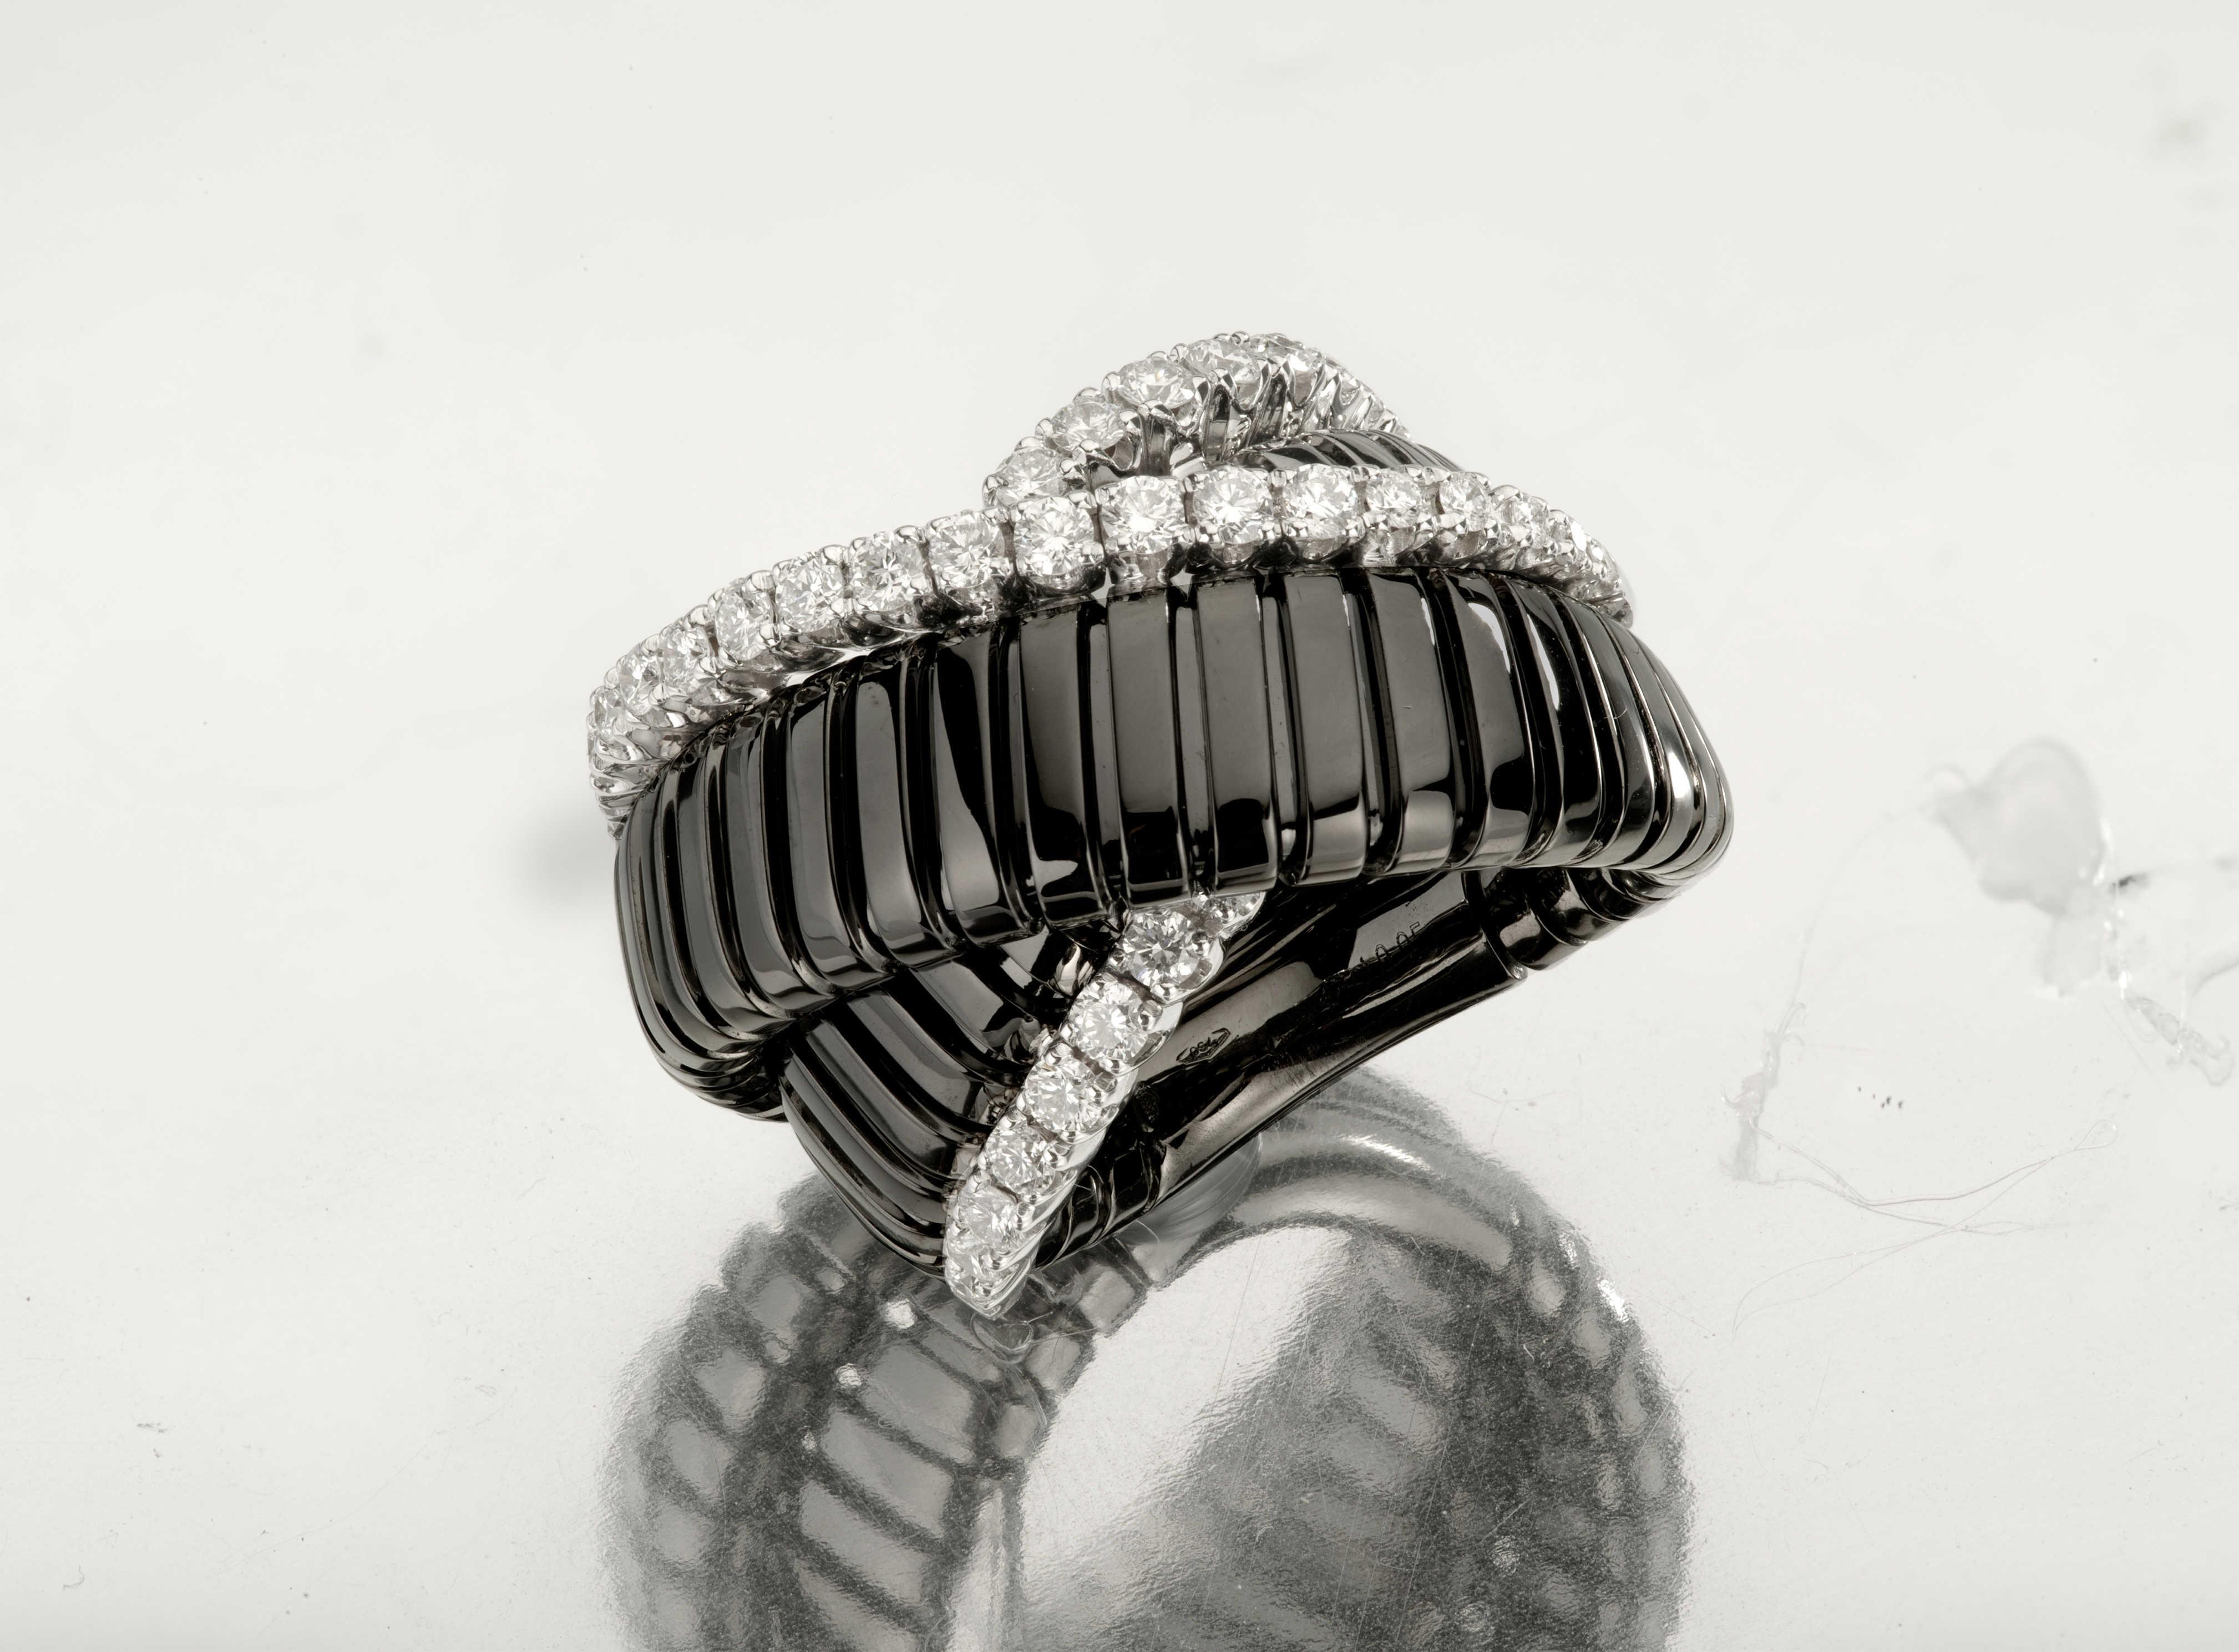 jewellery_retouch-1